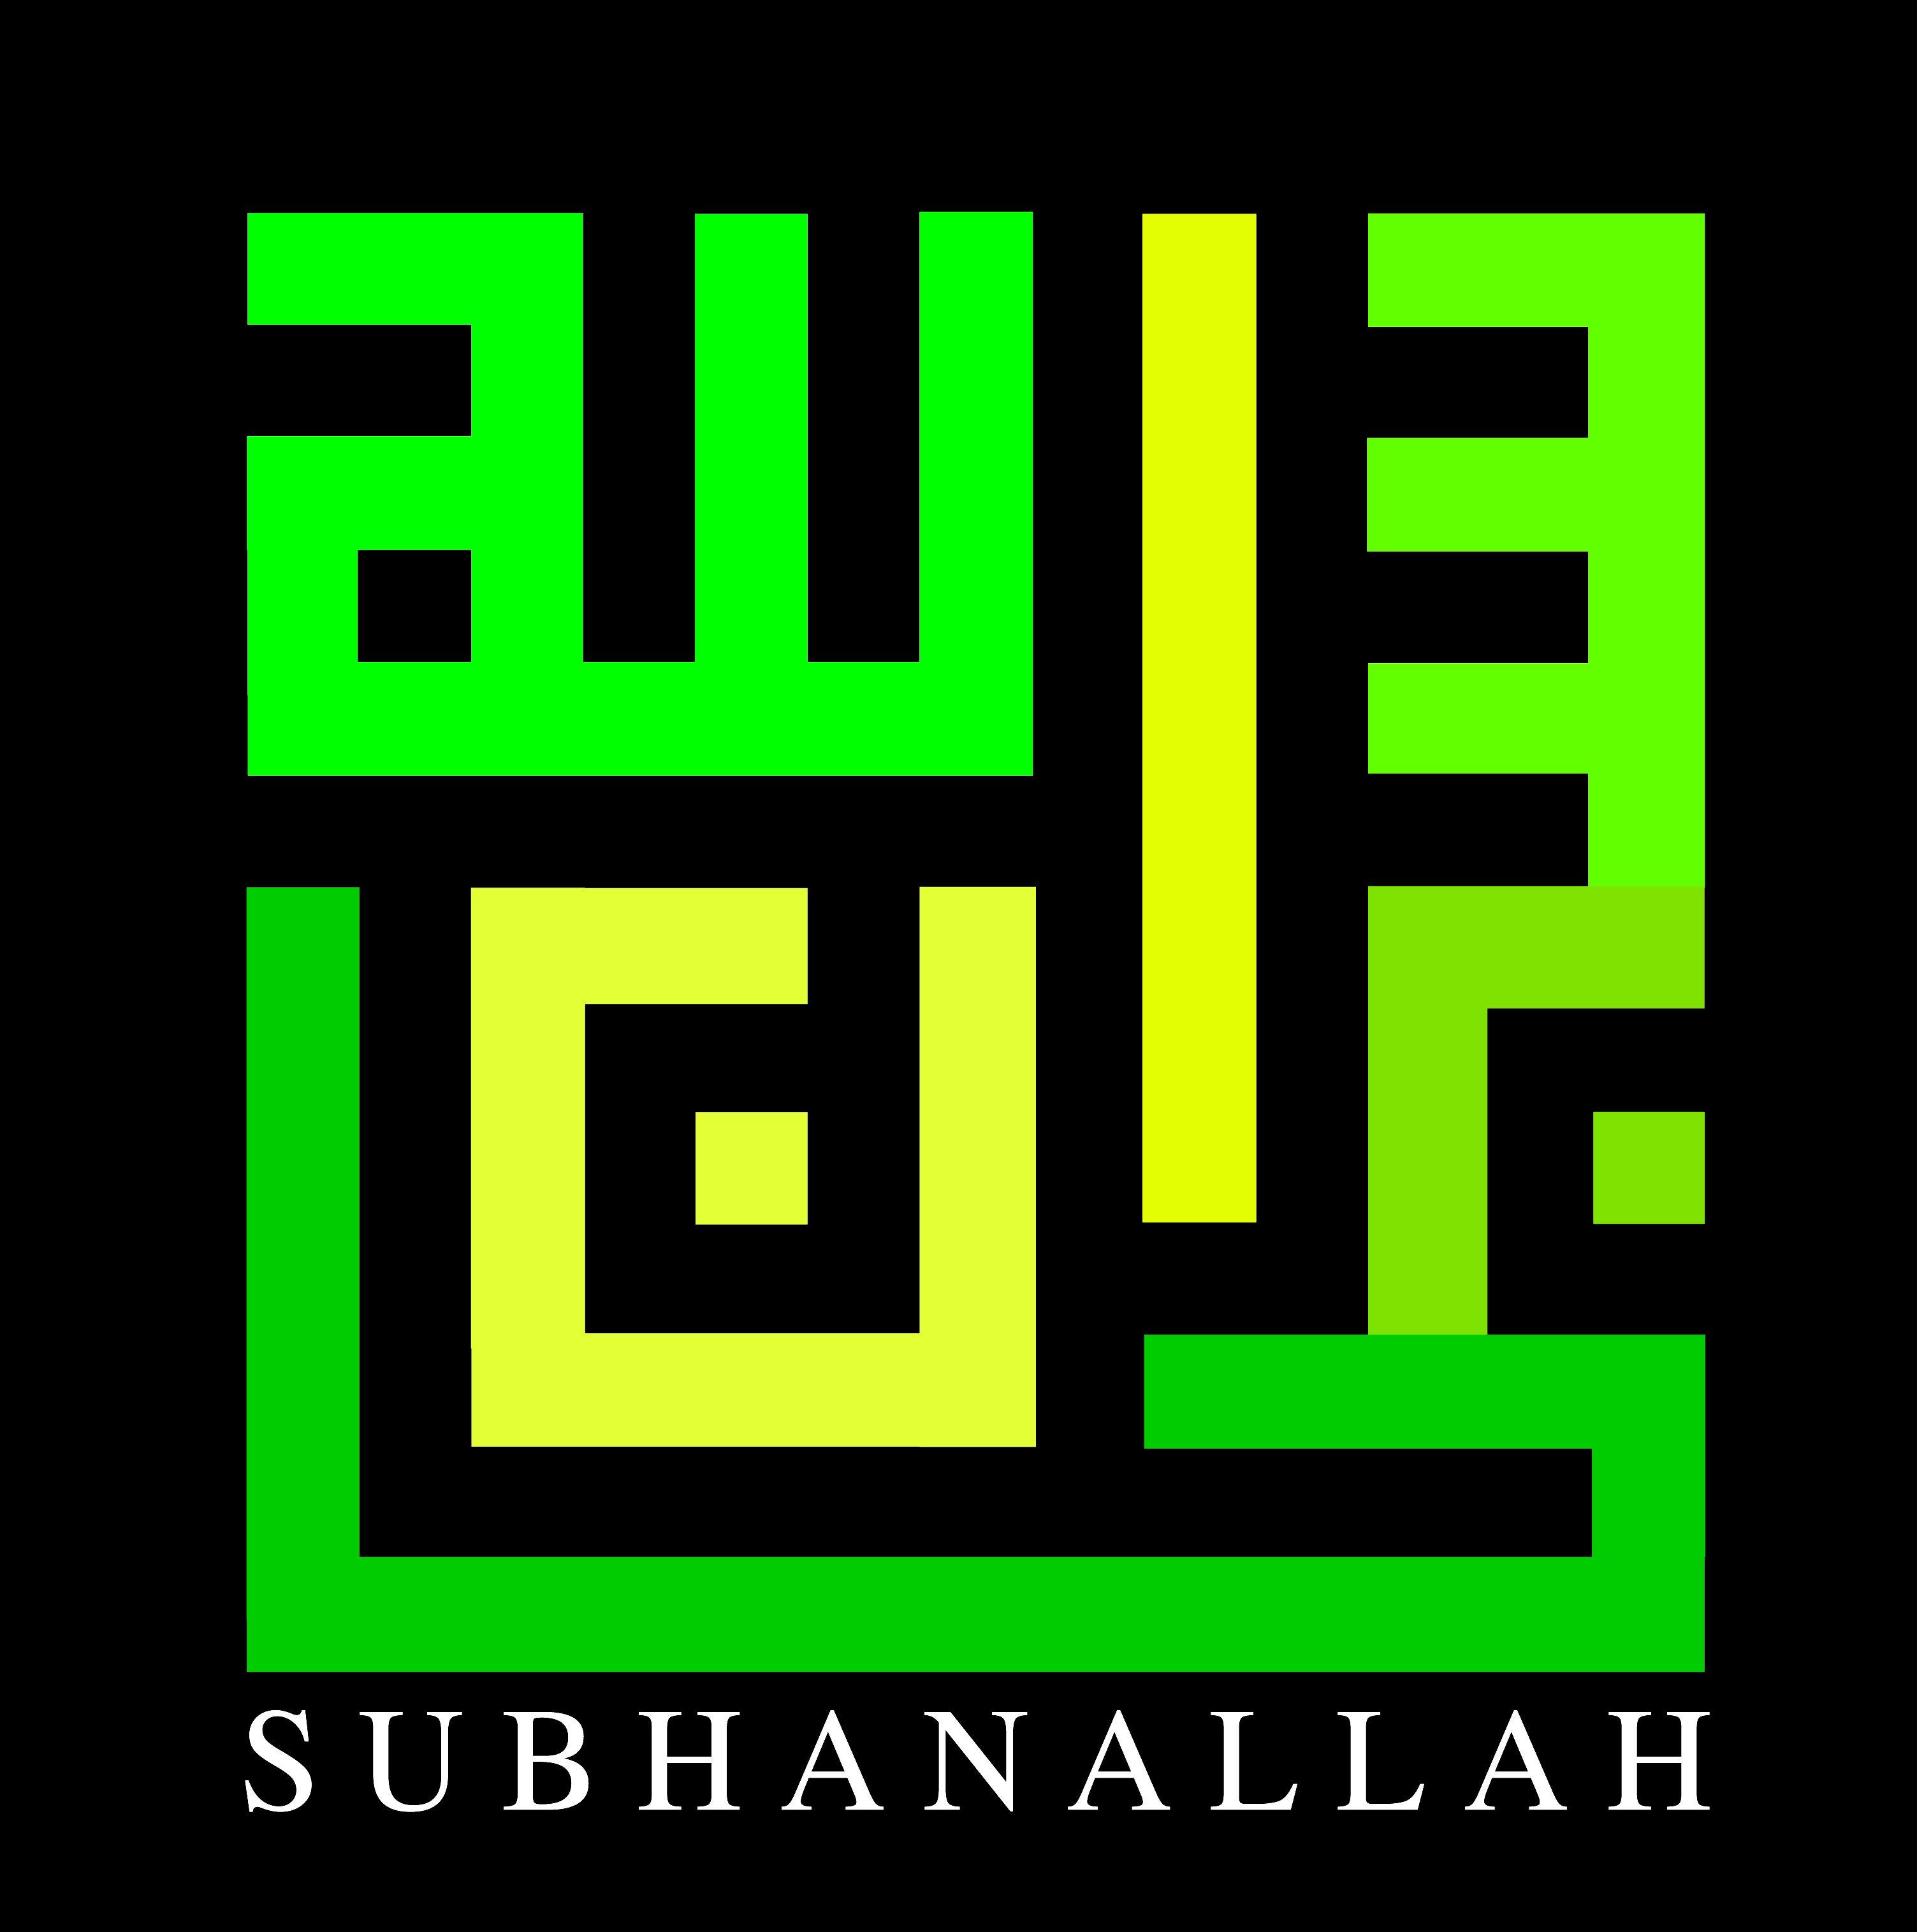 Subhanallah Seni kaligrafi, Kaligrafi islam, Seni